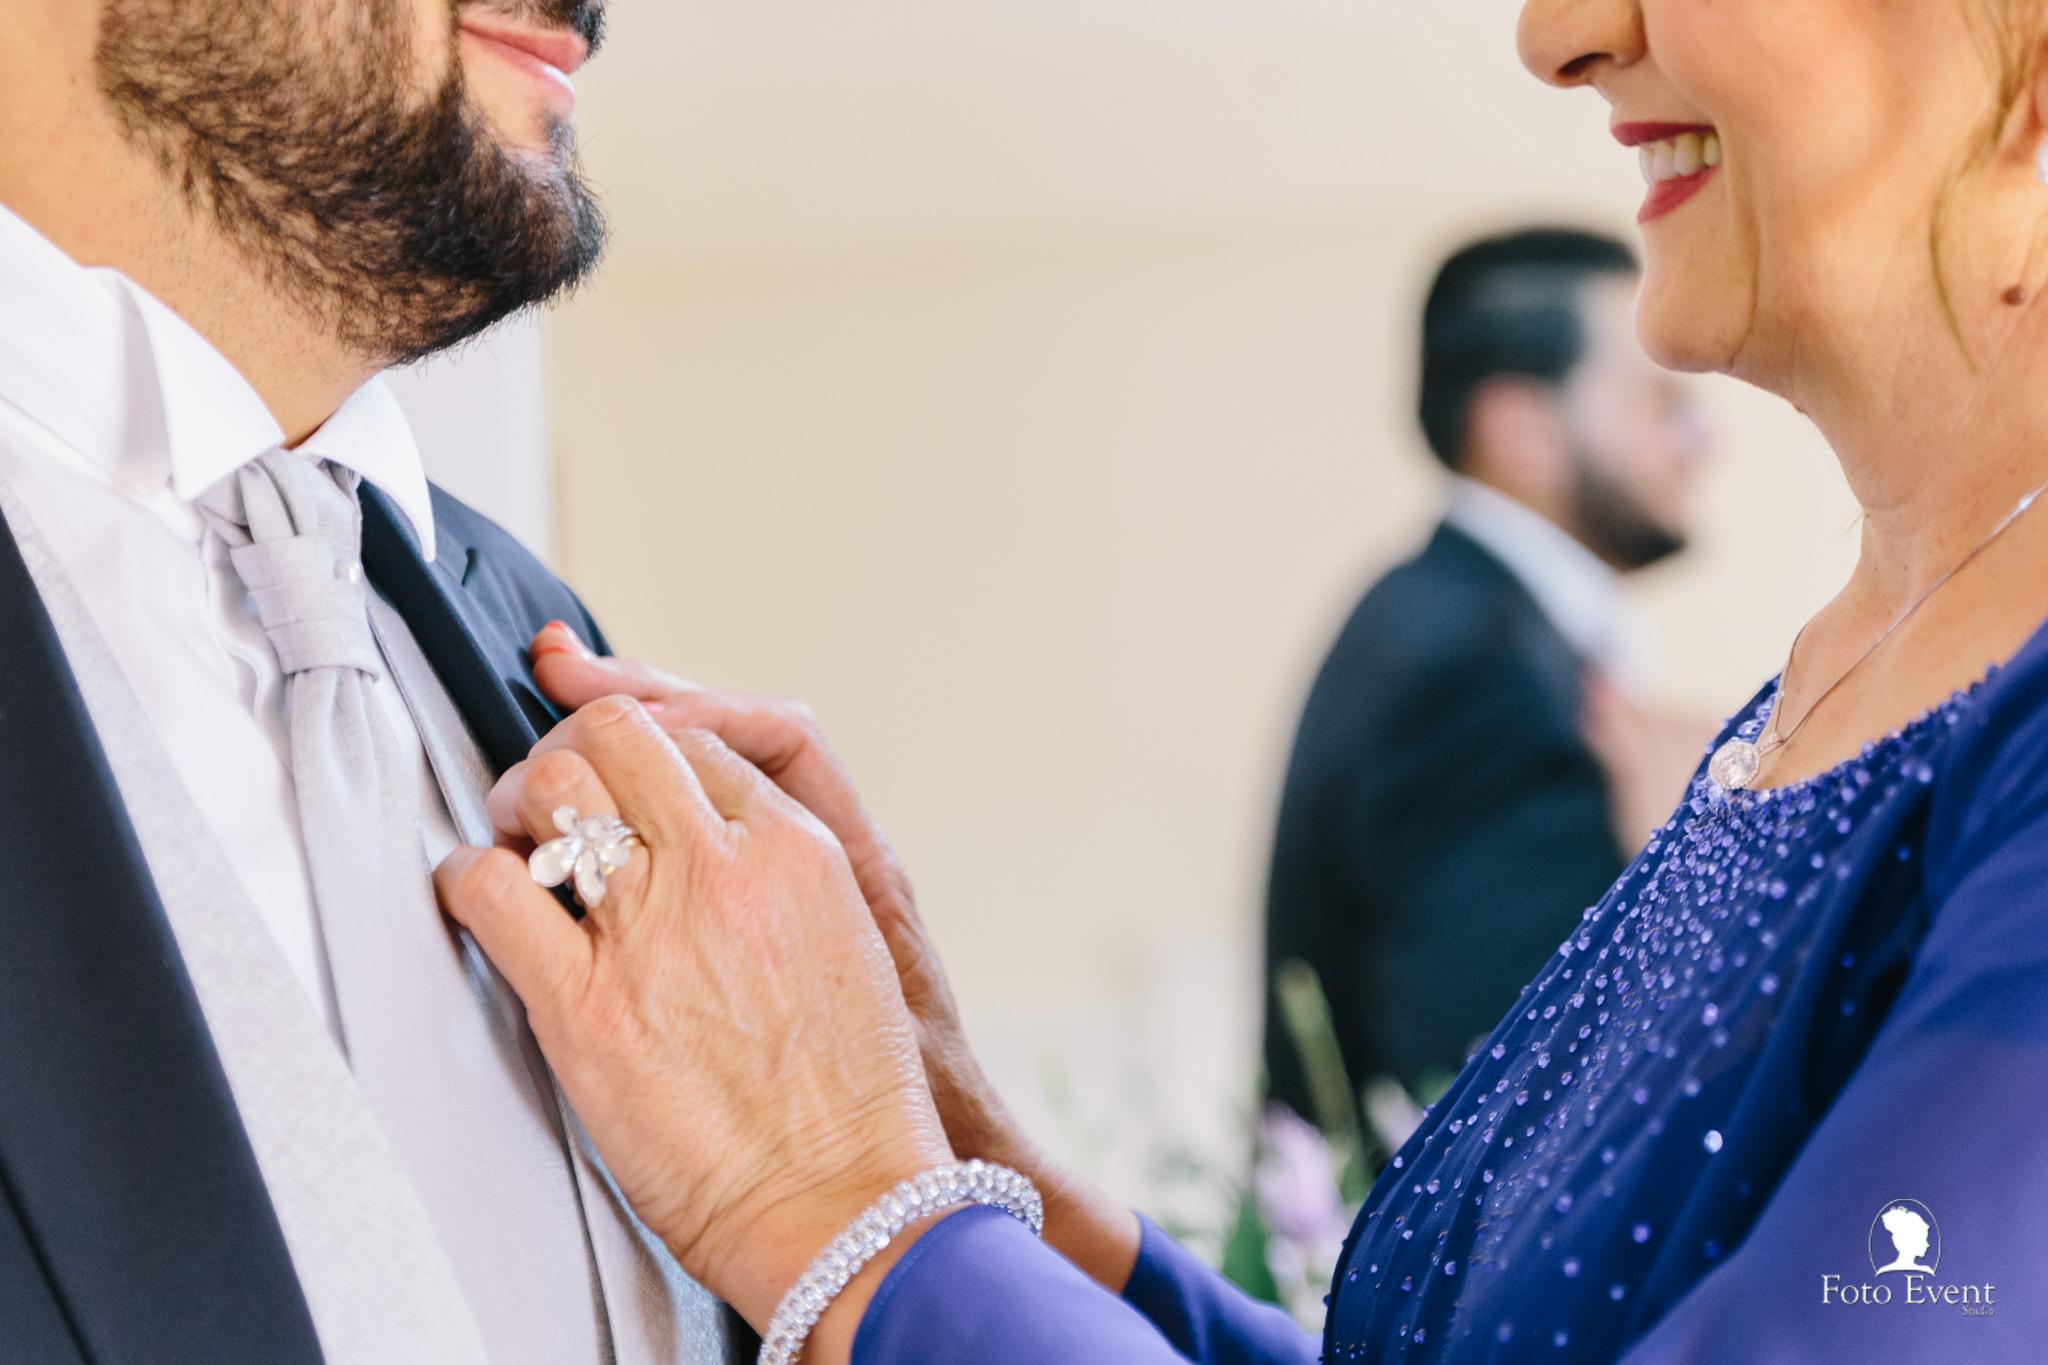 005-2019-09-09-Matrimonio-Dorotea-e-Alberto-Iemmolo-5DN-126